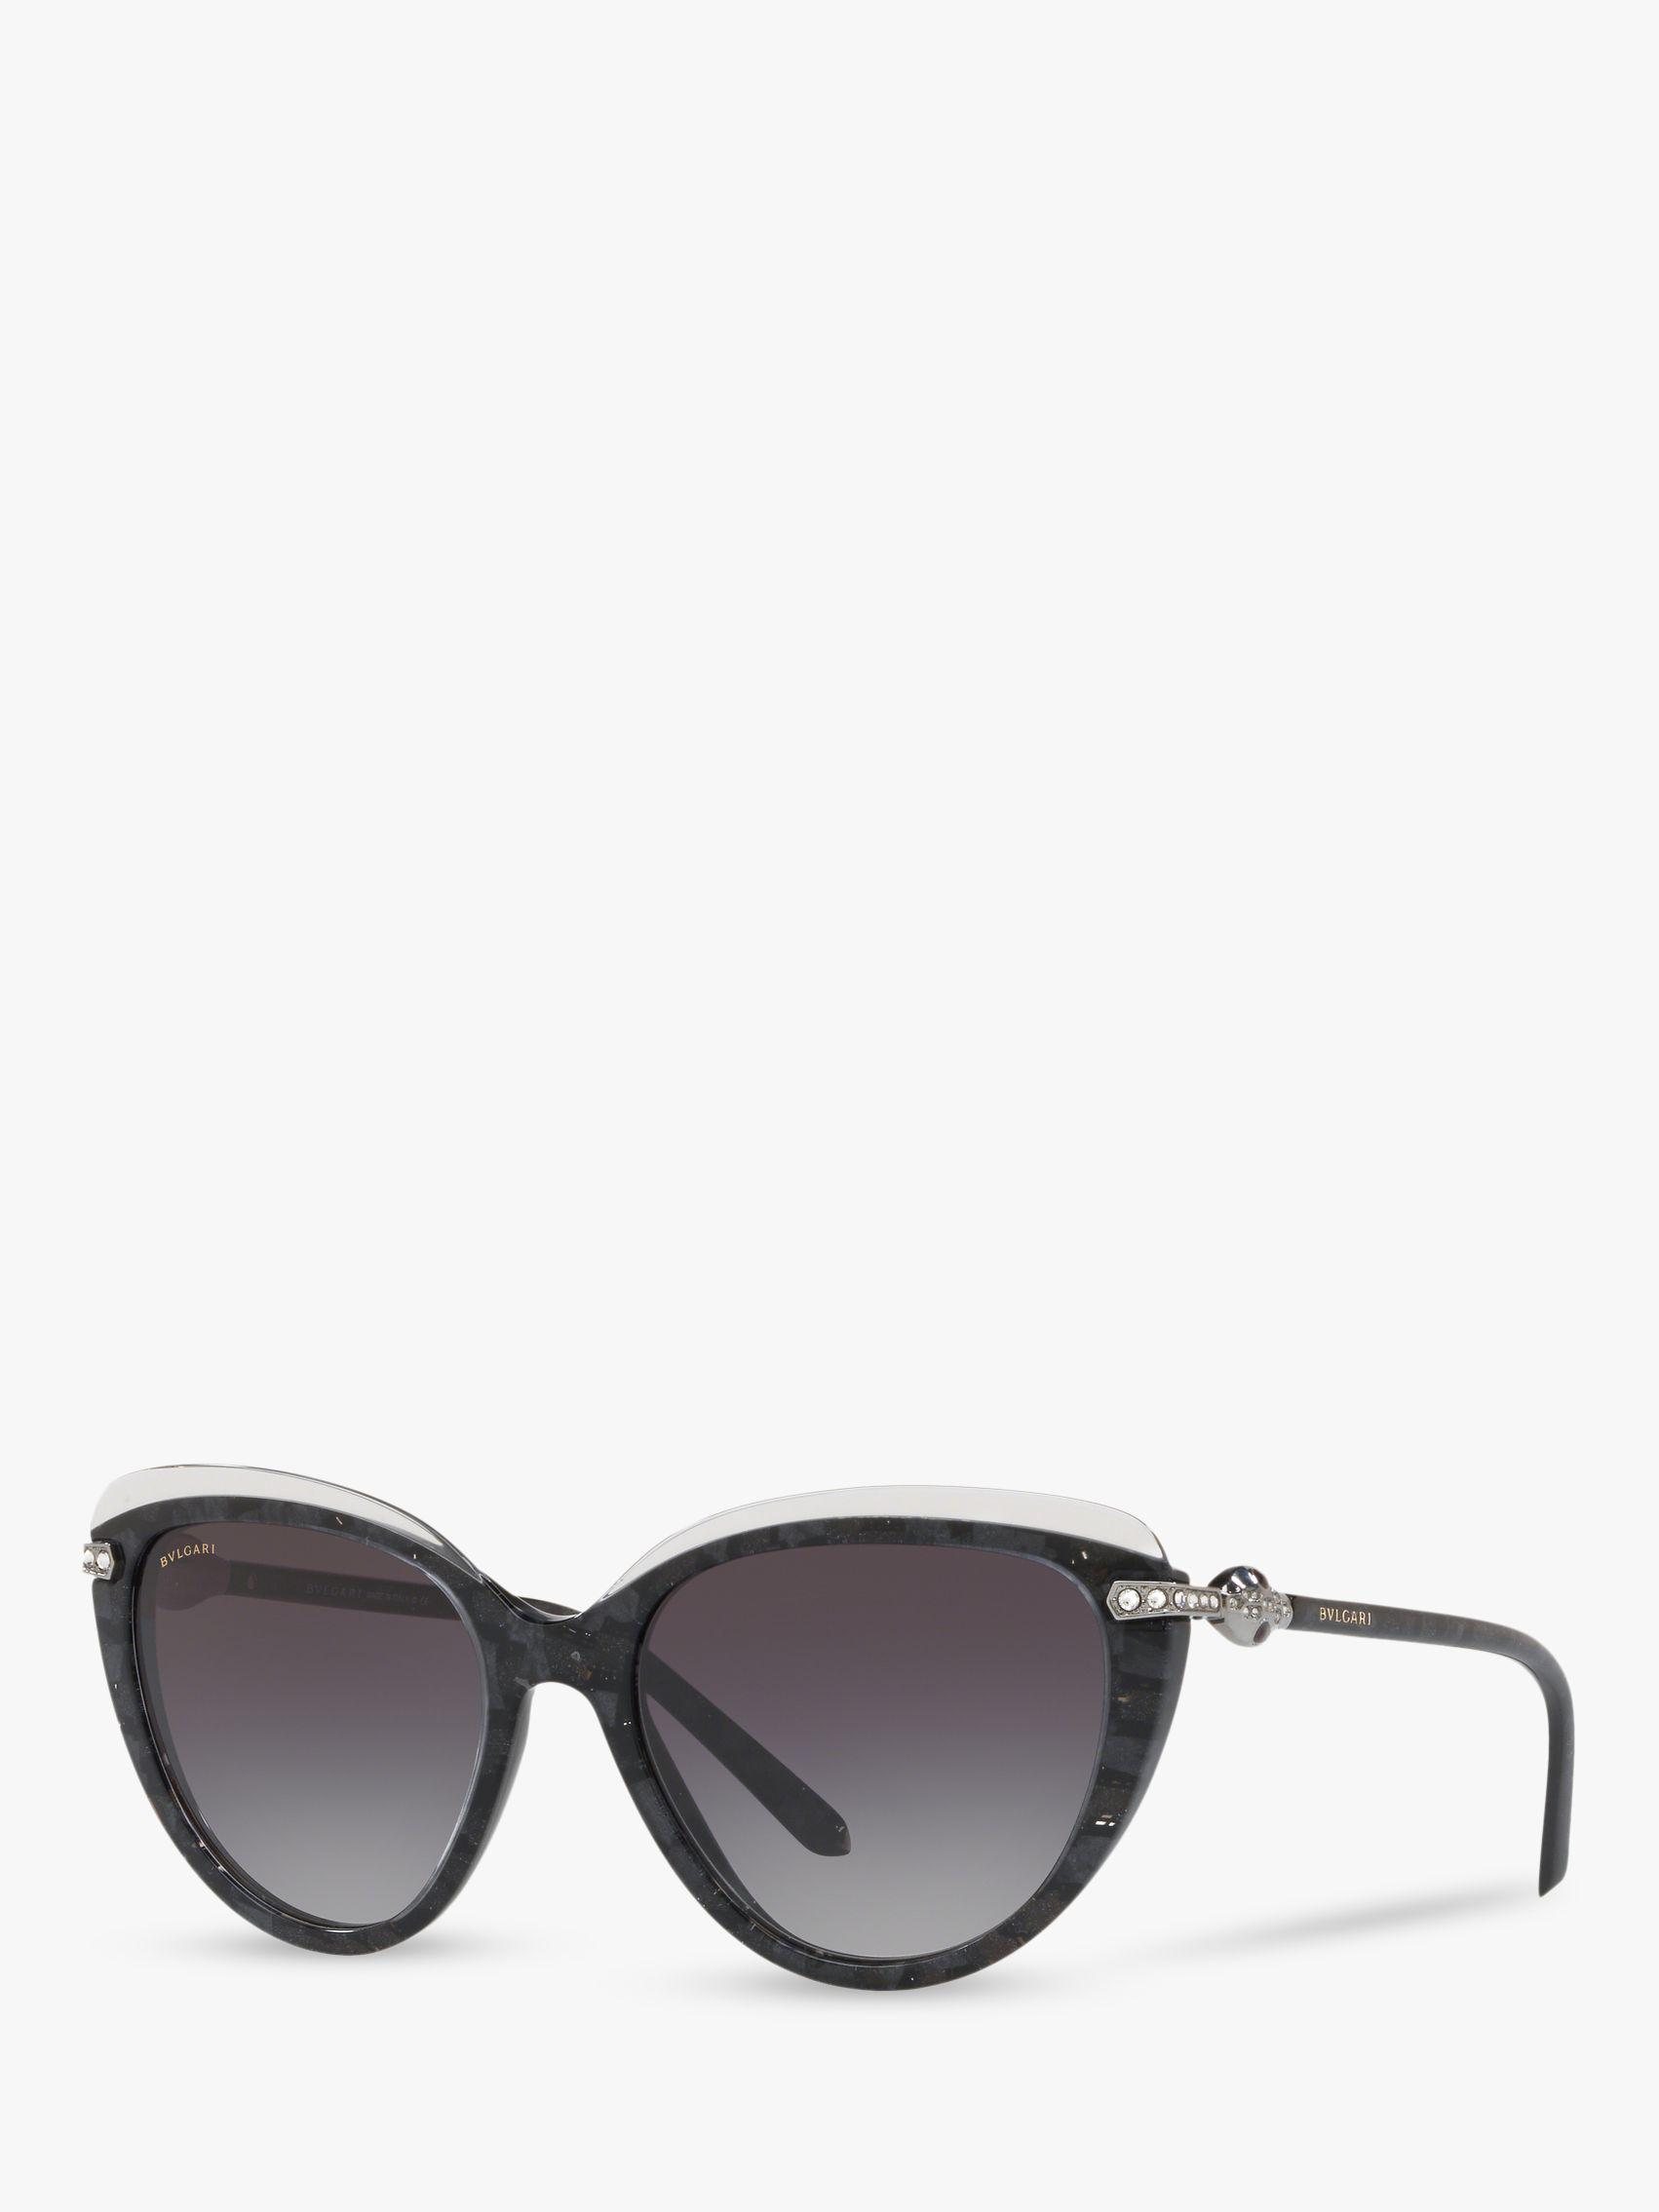 3dd0265c5d BVLGARI Bv8211b55 Women s Cat s Eye Sunglasses in Black - Lyst